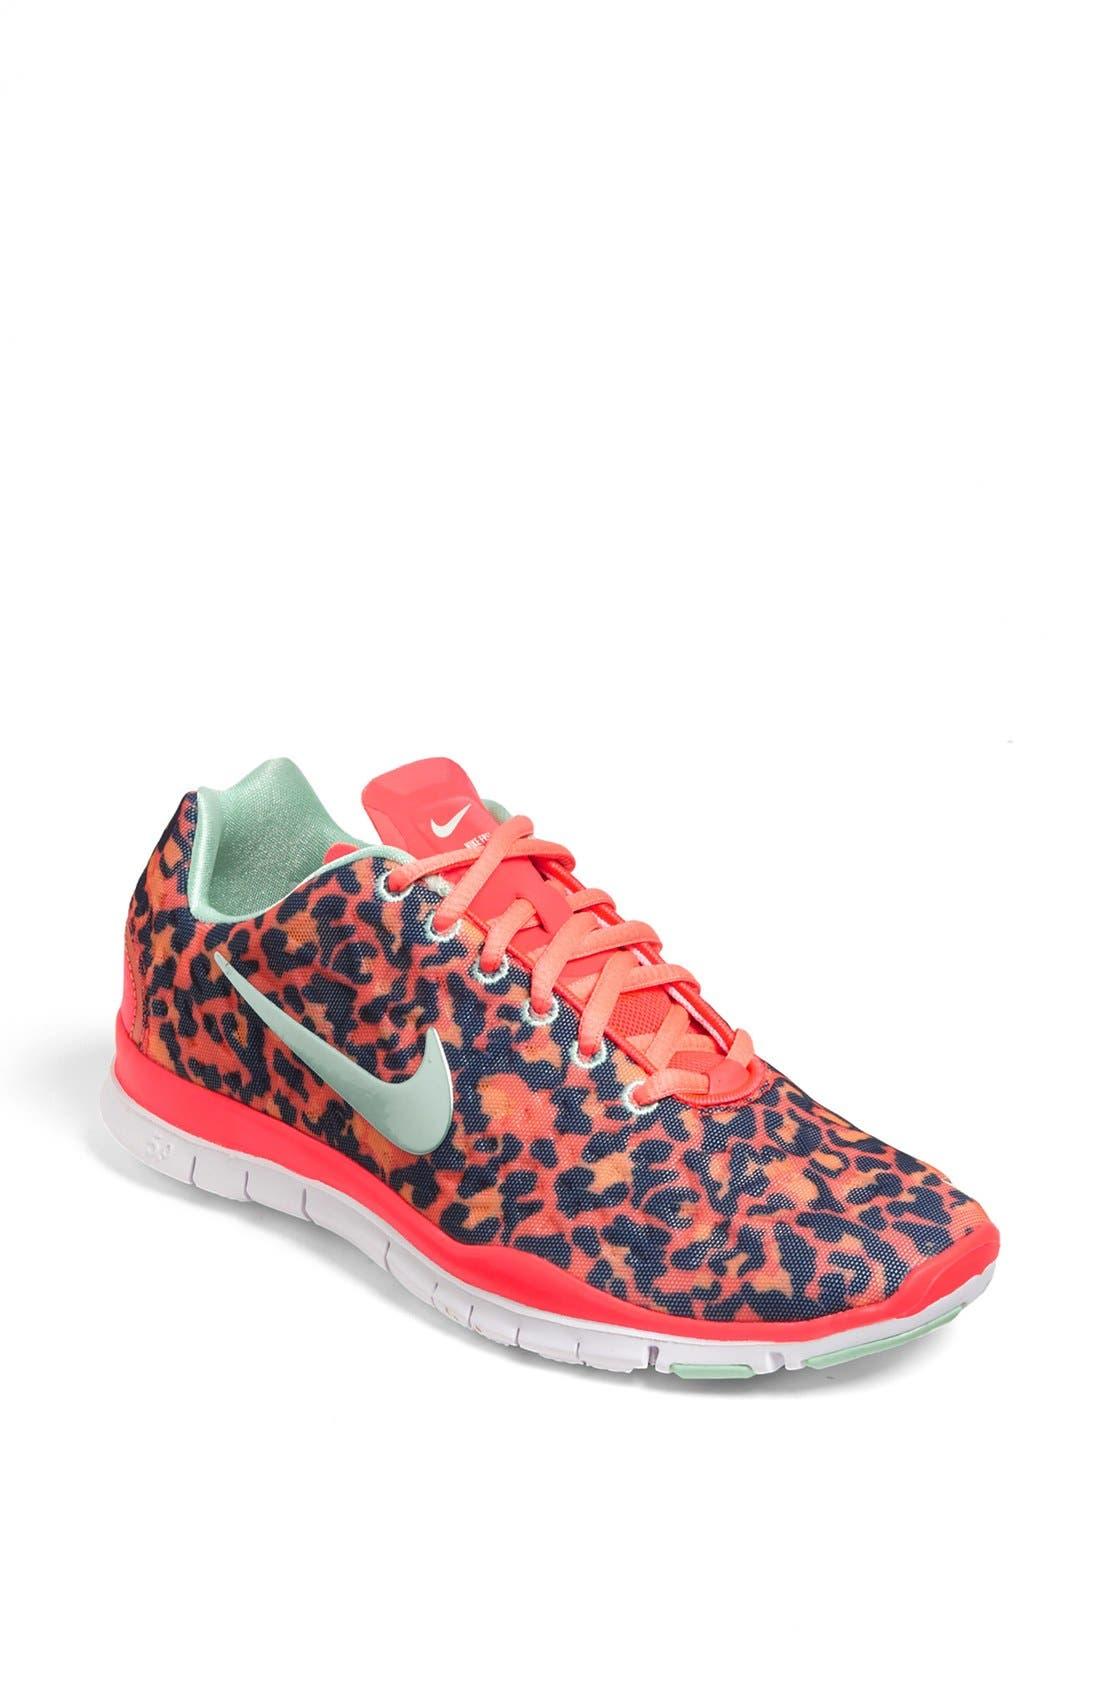 Main Image - Nike 'Free TR Fit 3 Print' Training Shoe (Women)